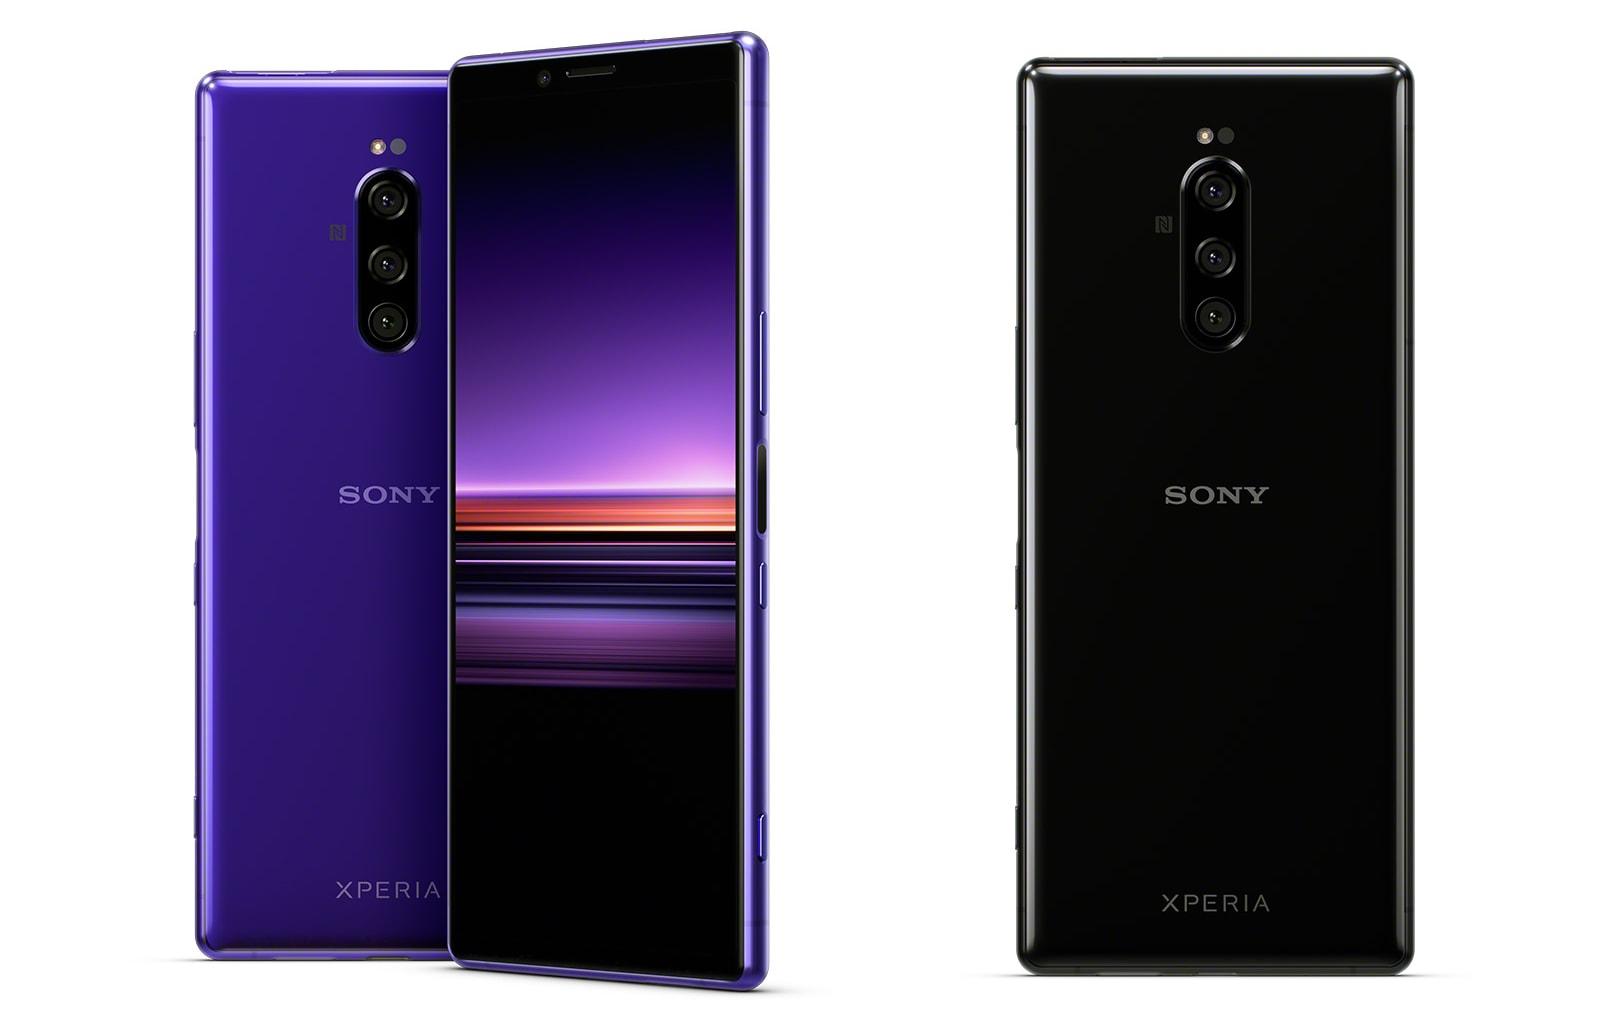 Sony Xperia 1 4K HDR cinematic screen OLED